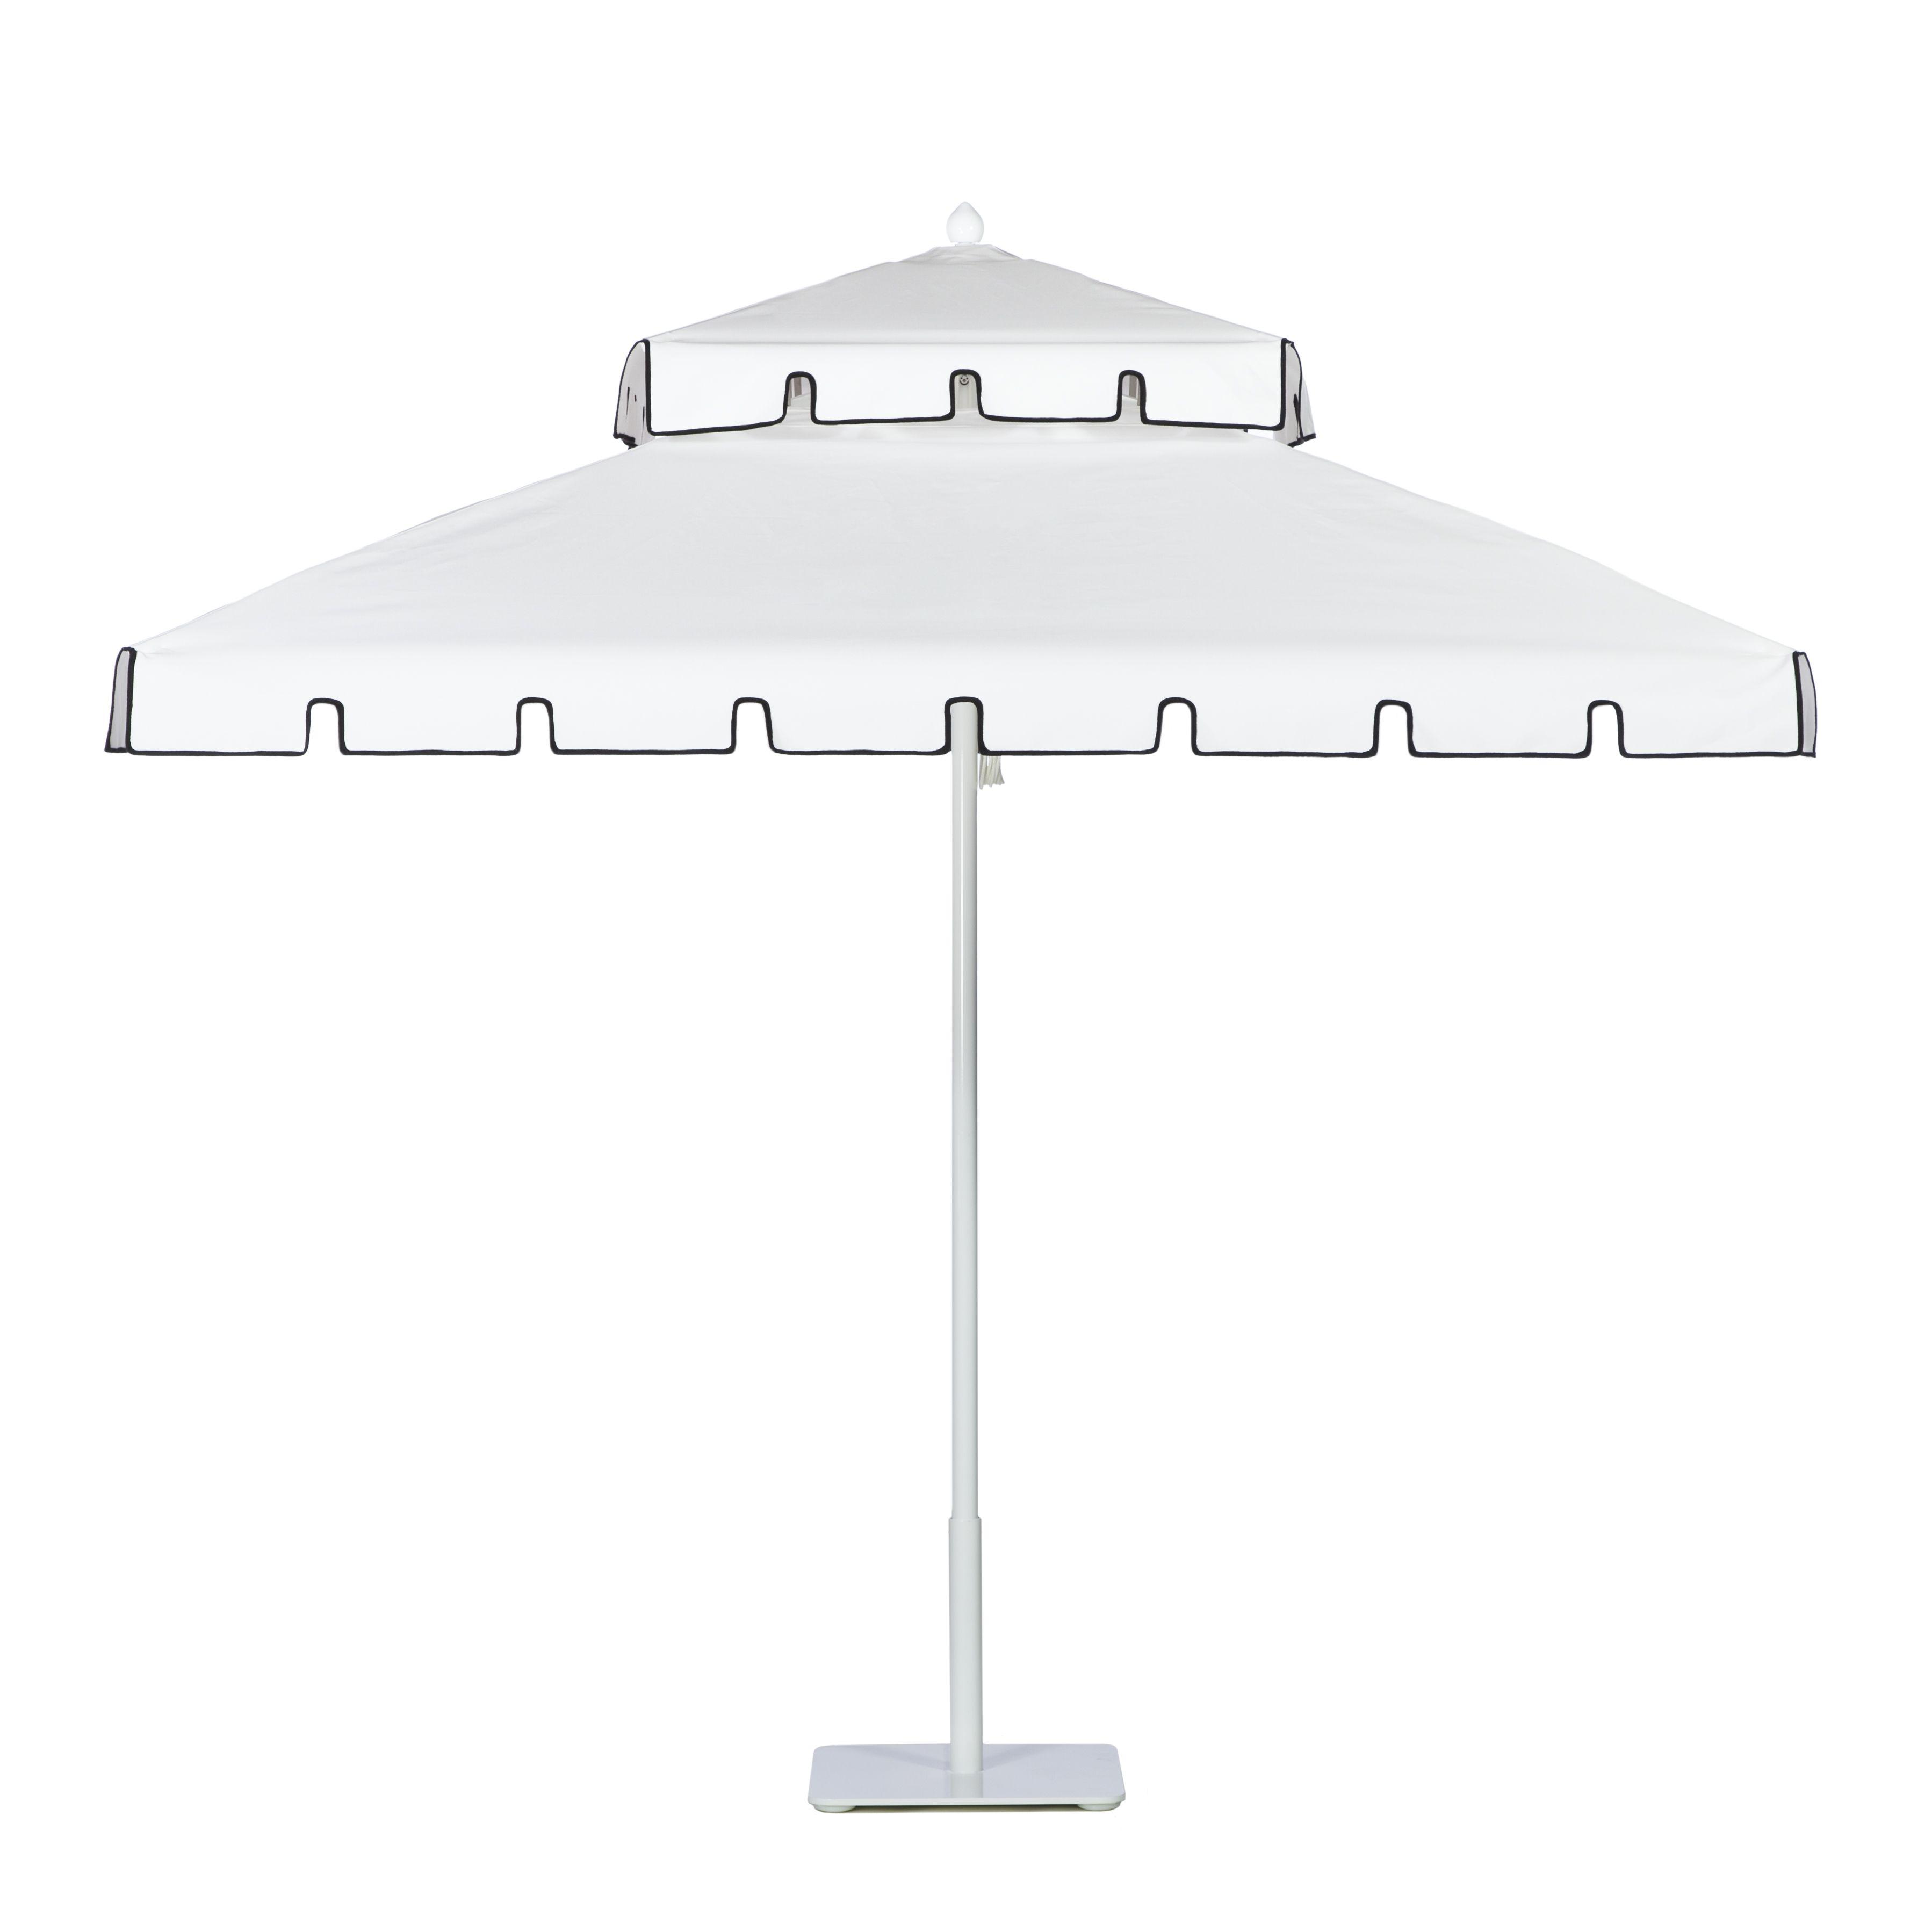 Double Decker aluminum umbrella with White frame in Whitecap